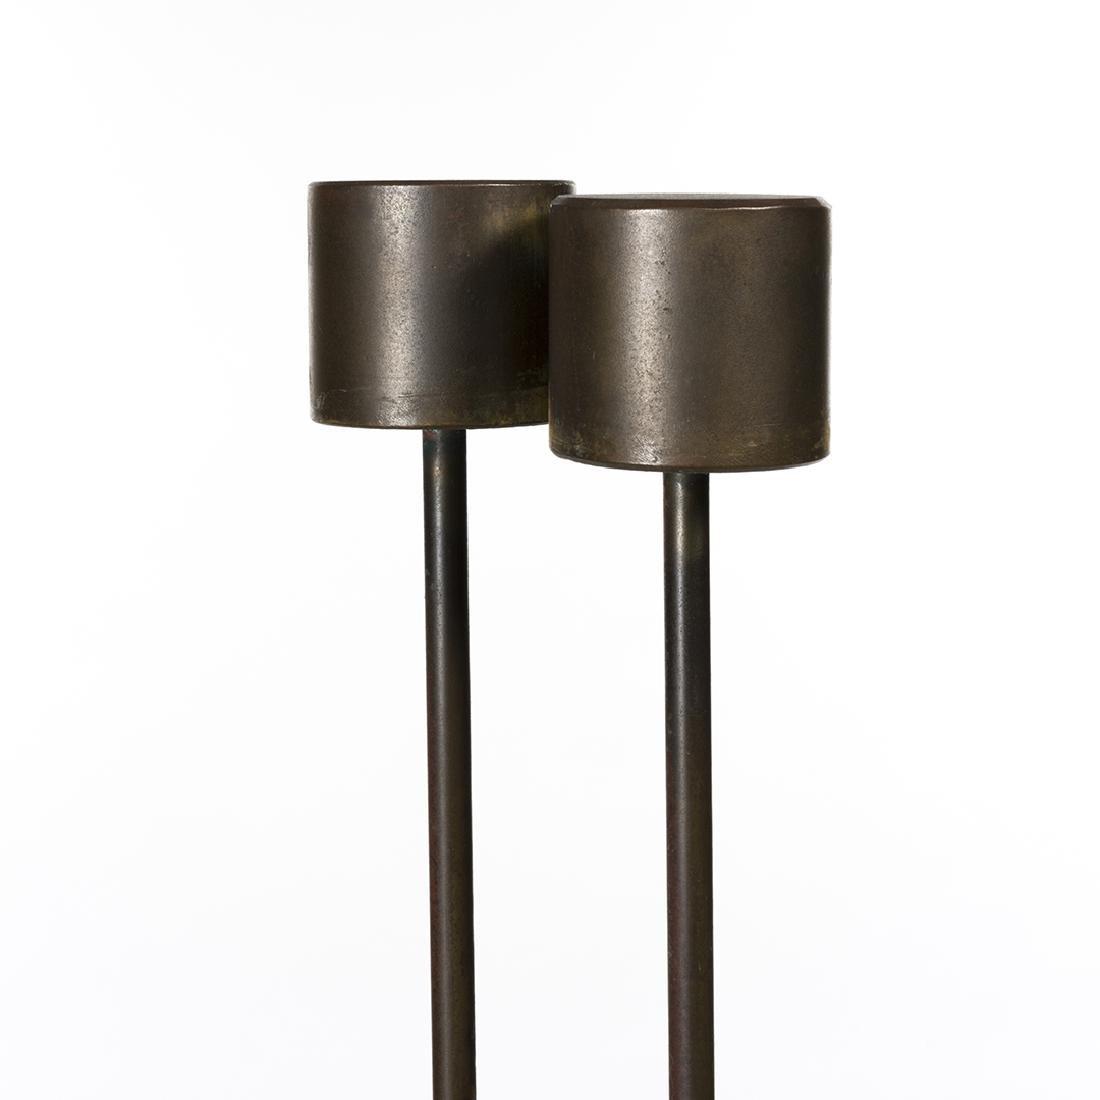 Val Bertoia Sonambient Sculpture - 2